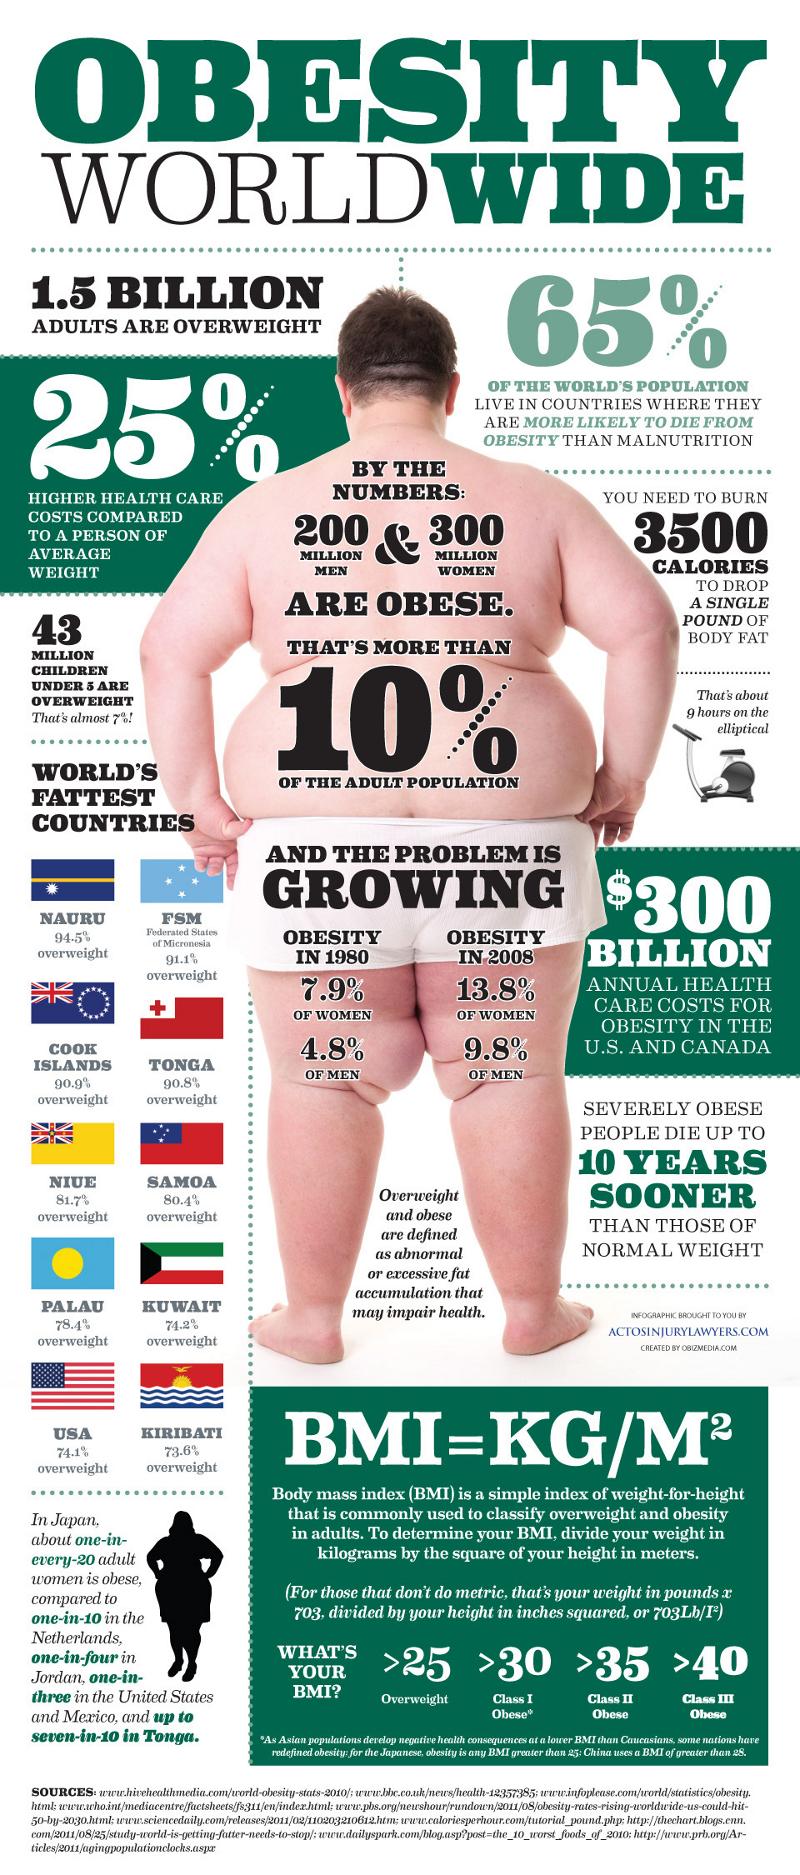 Global Obesity Statistics